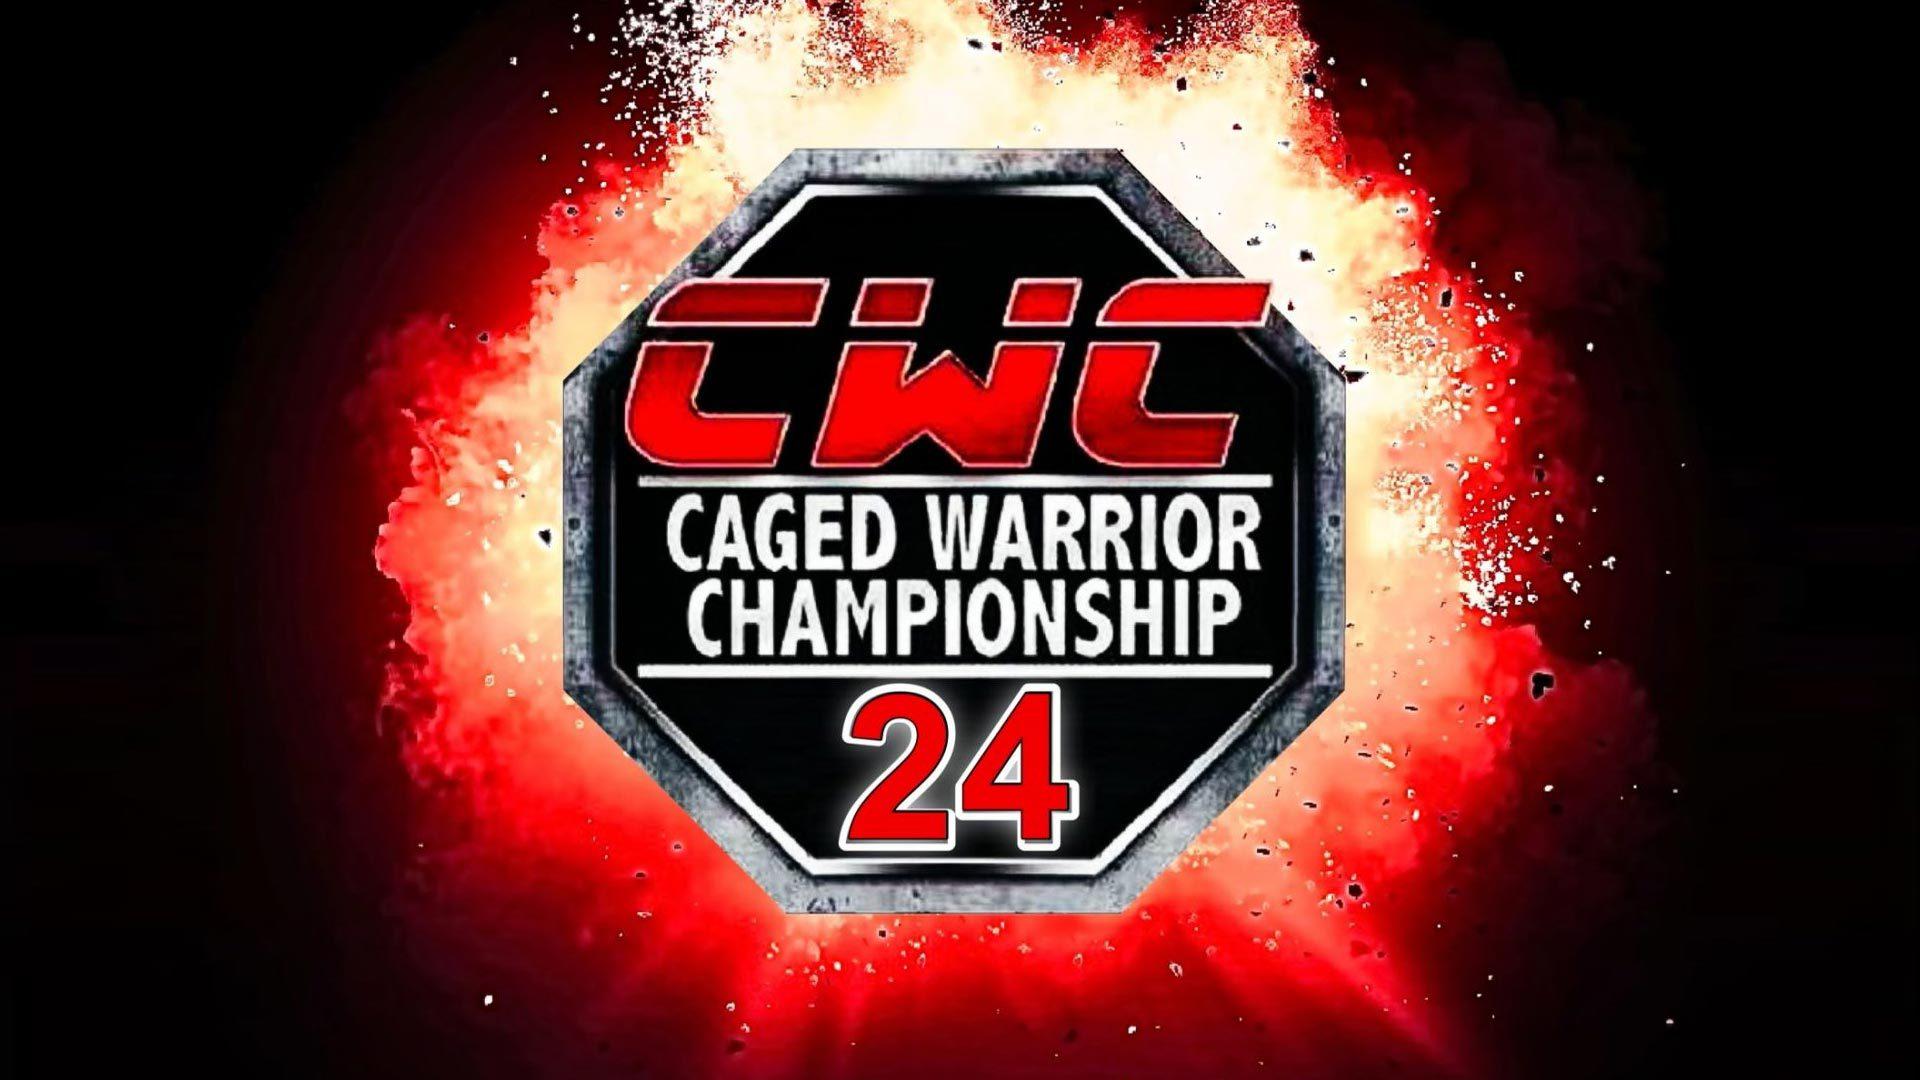 CWC Caged Warrior Championship 24